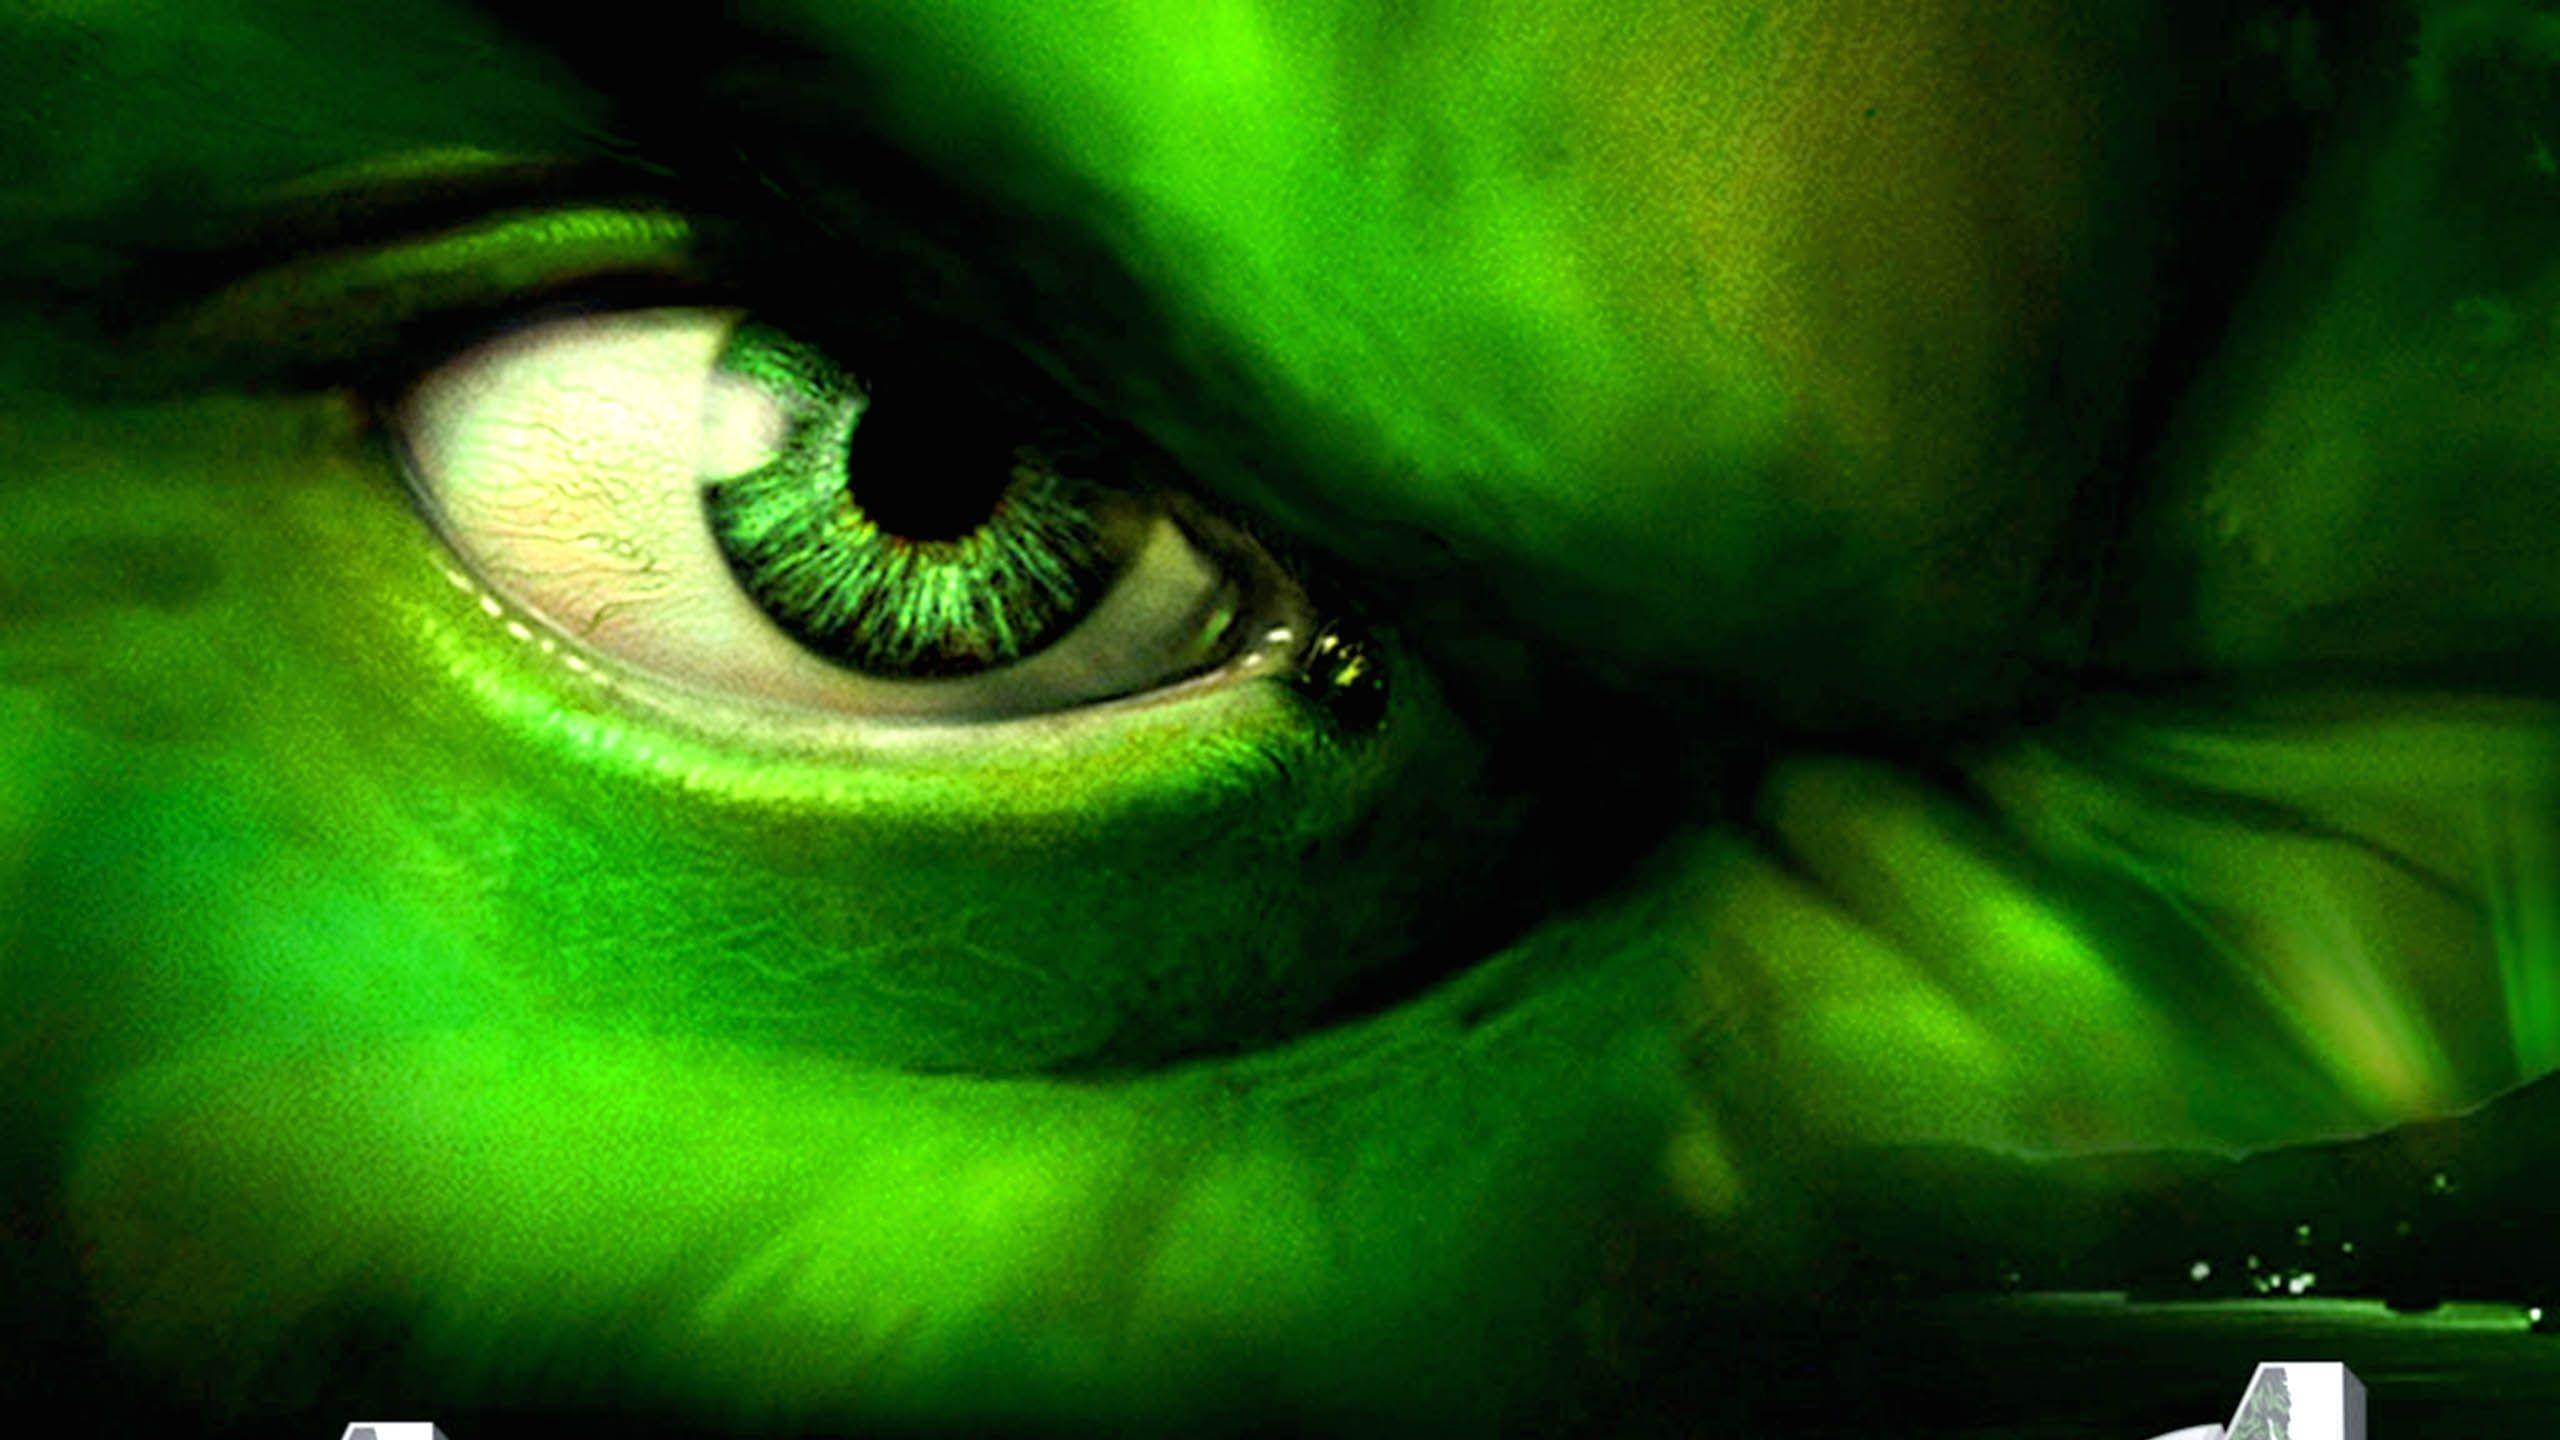 HD Hulk Wallpaper 74 images 2560x1440